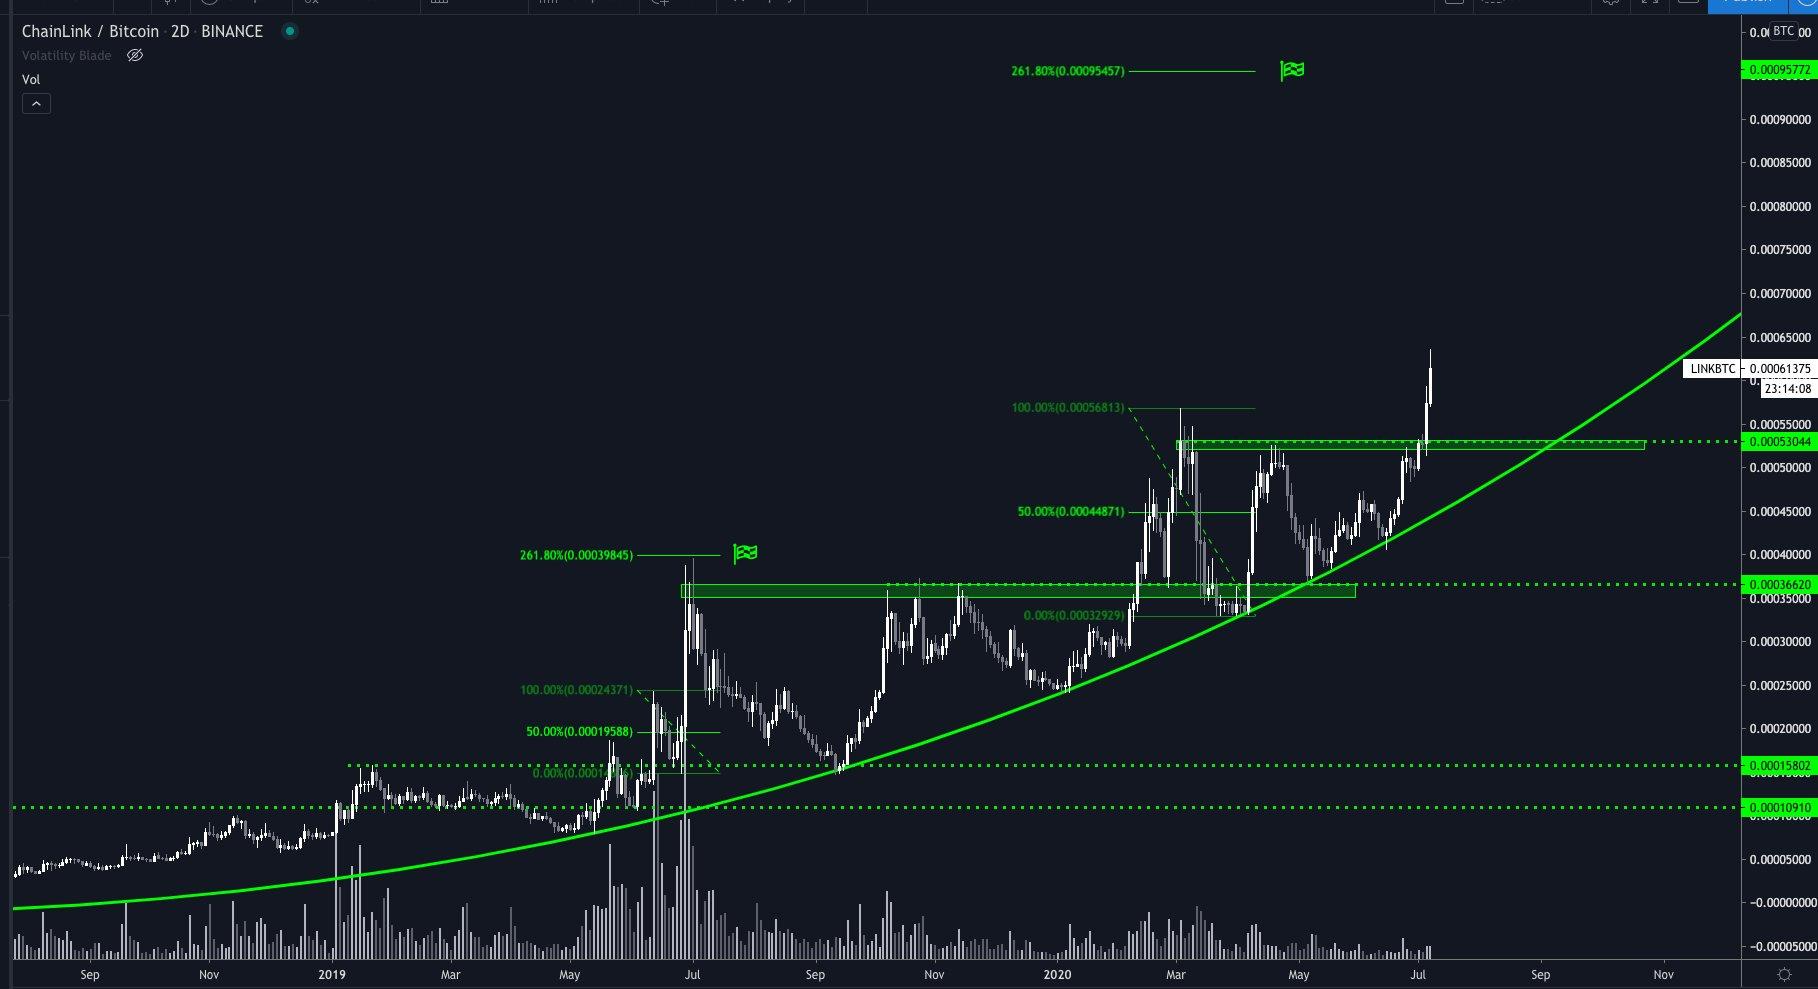 Chainlink/Bitcoin